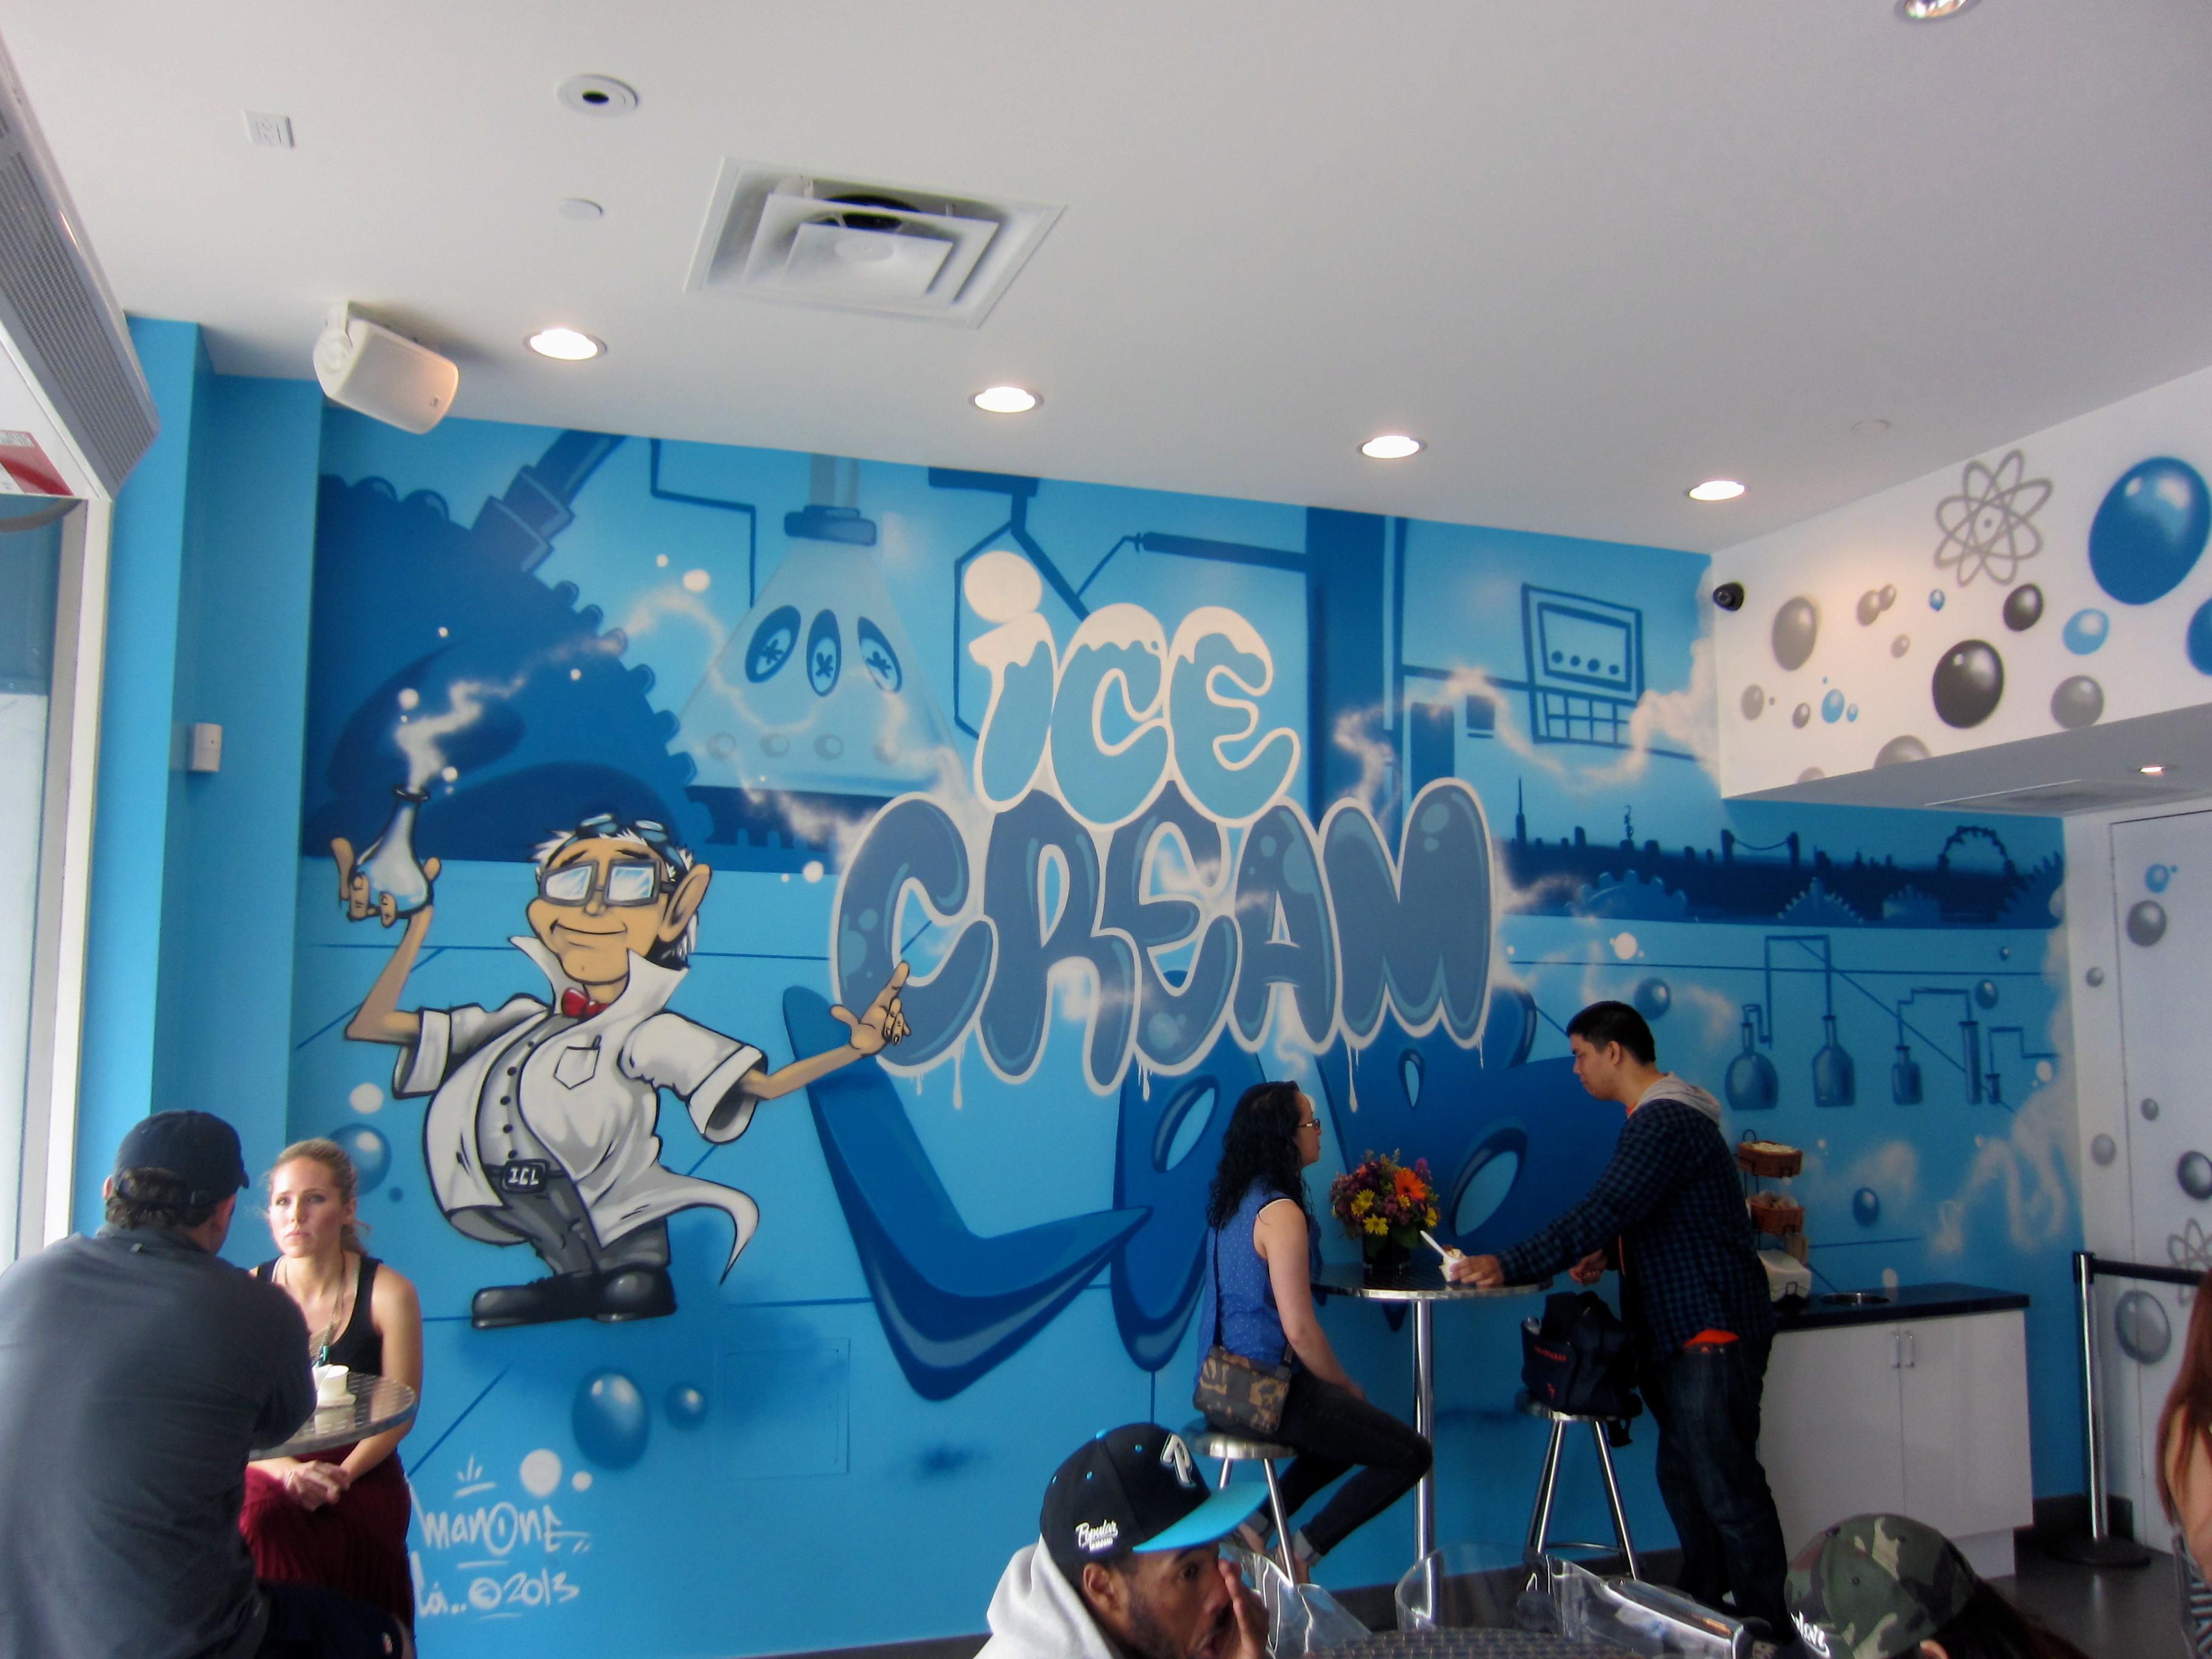 HAIKU REVIEW: ICE CREAM LAB | Feed The Monster